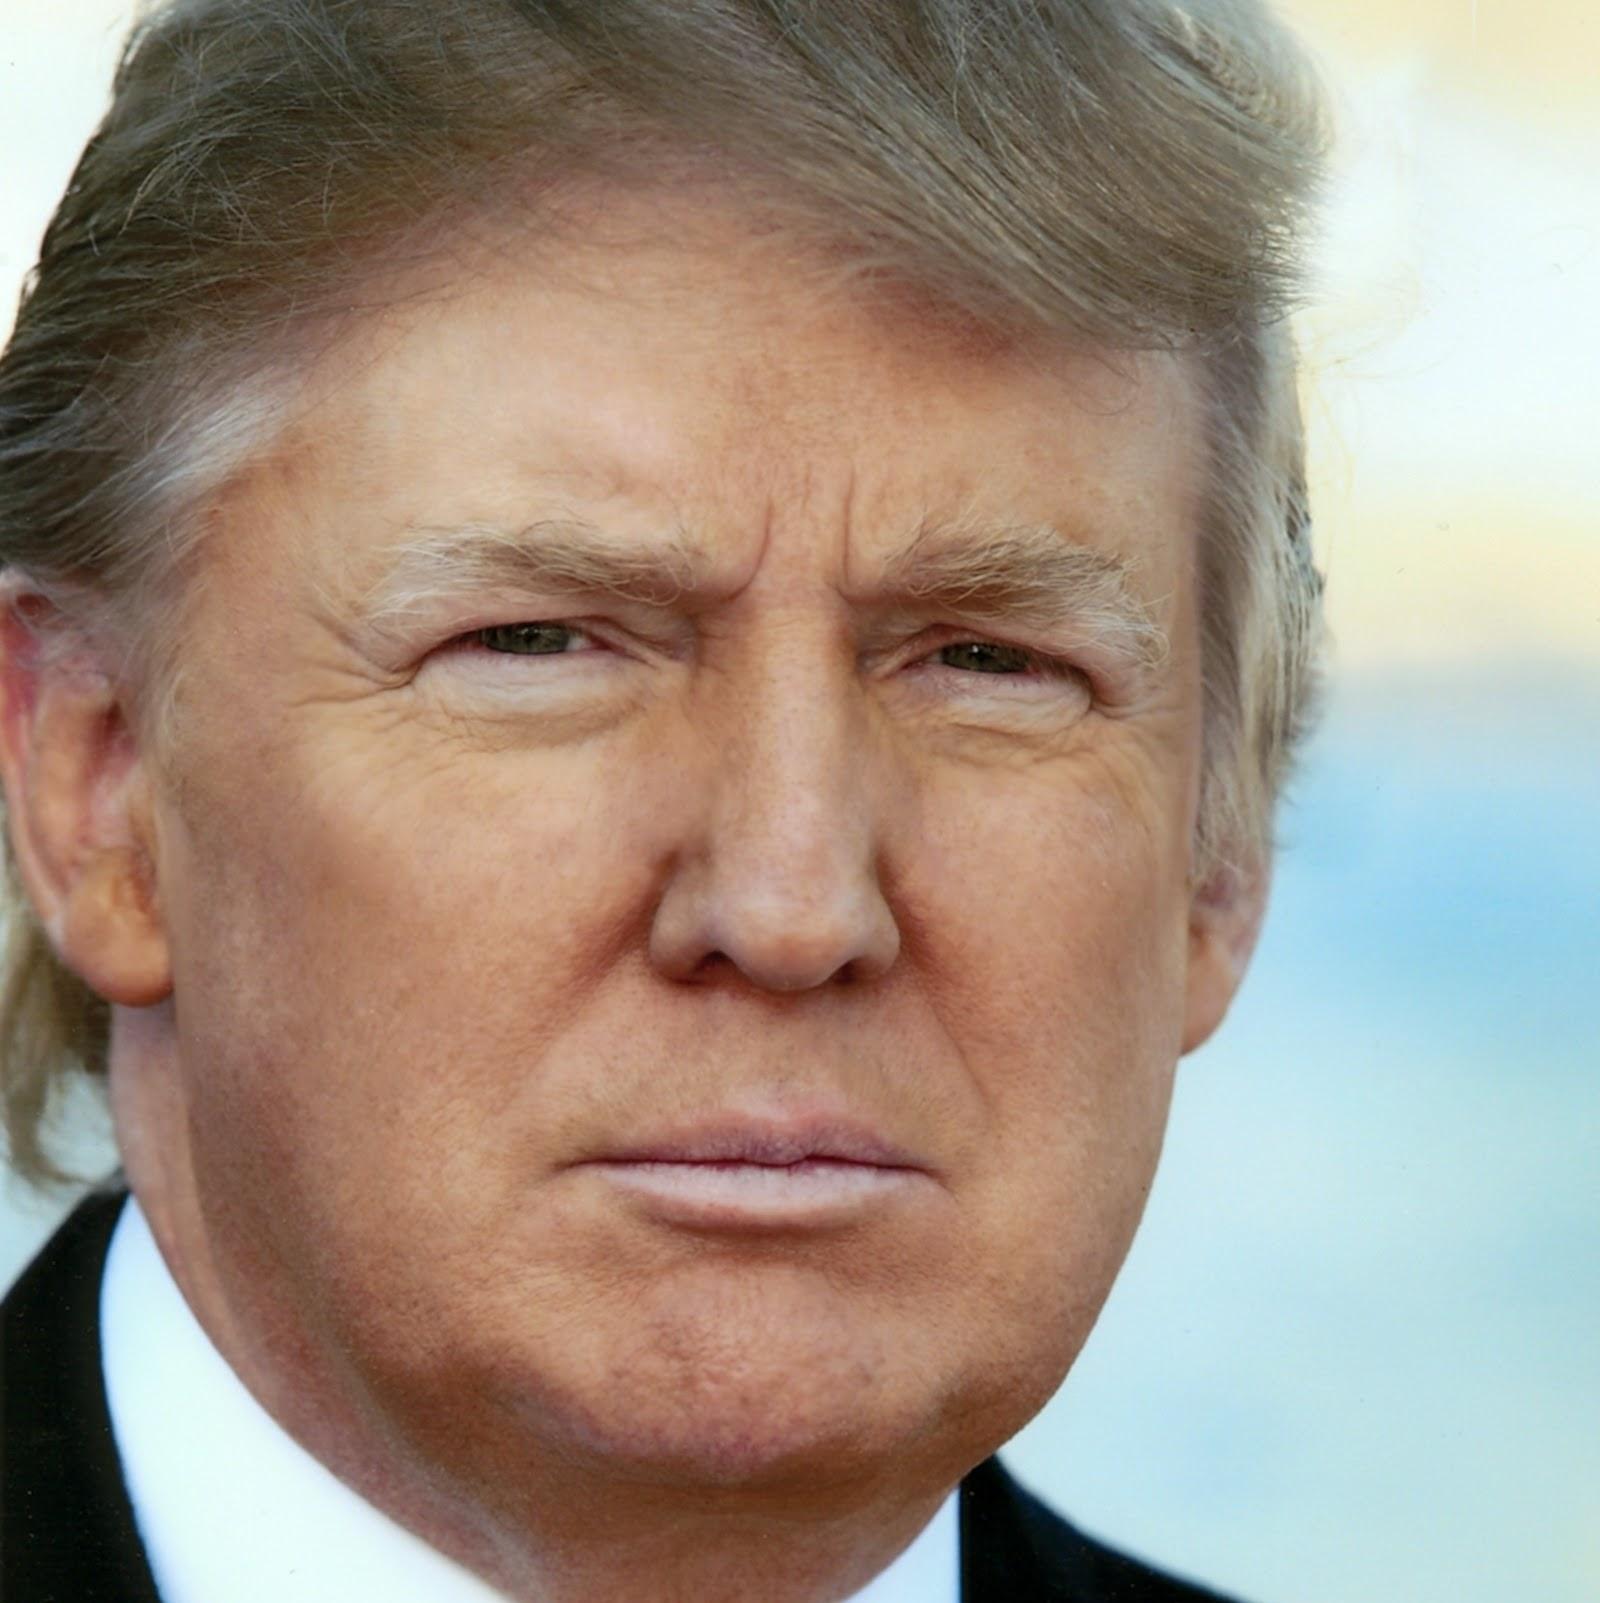 Mr. Trump- Yellow Tie.JPG